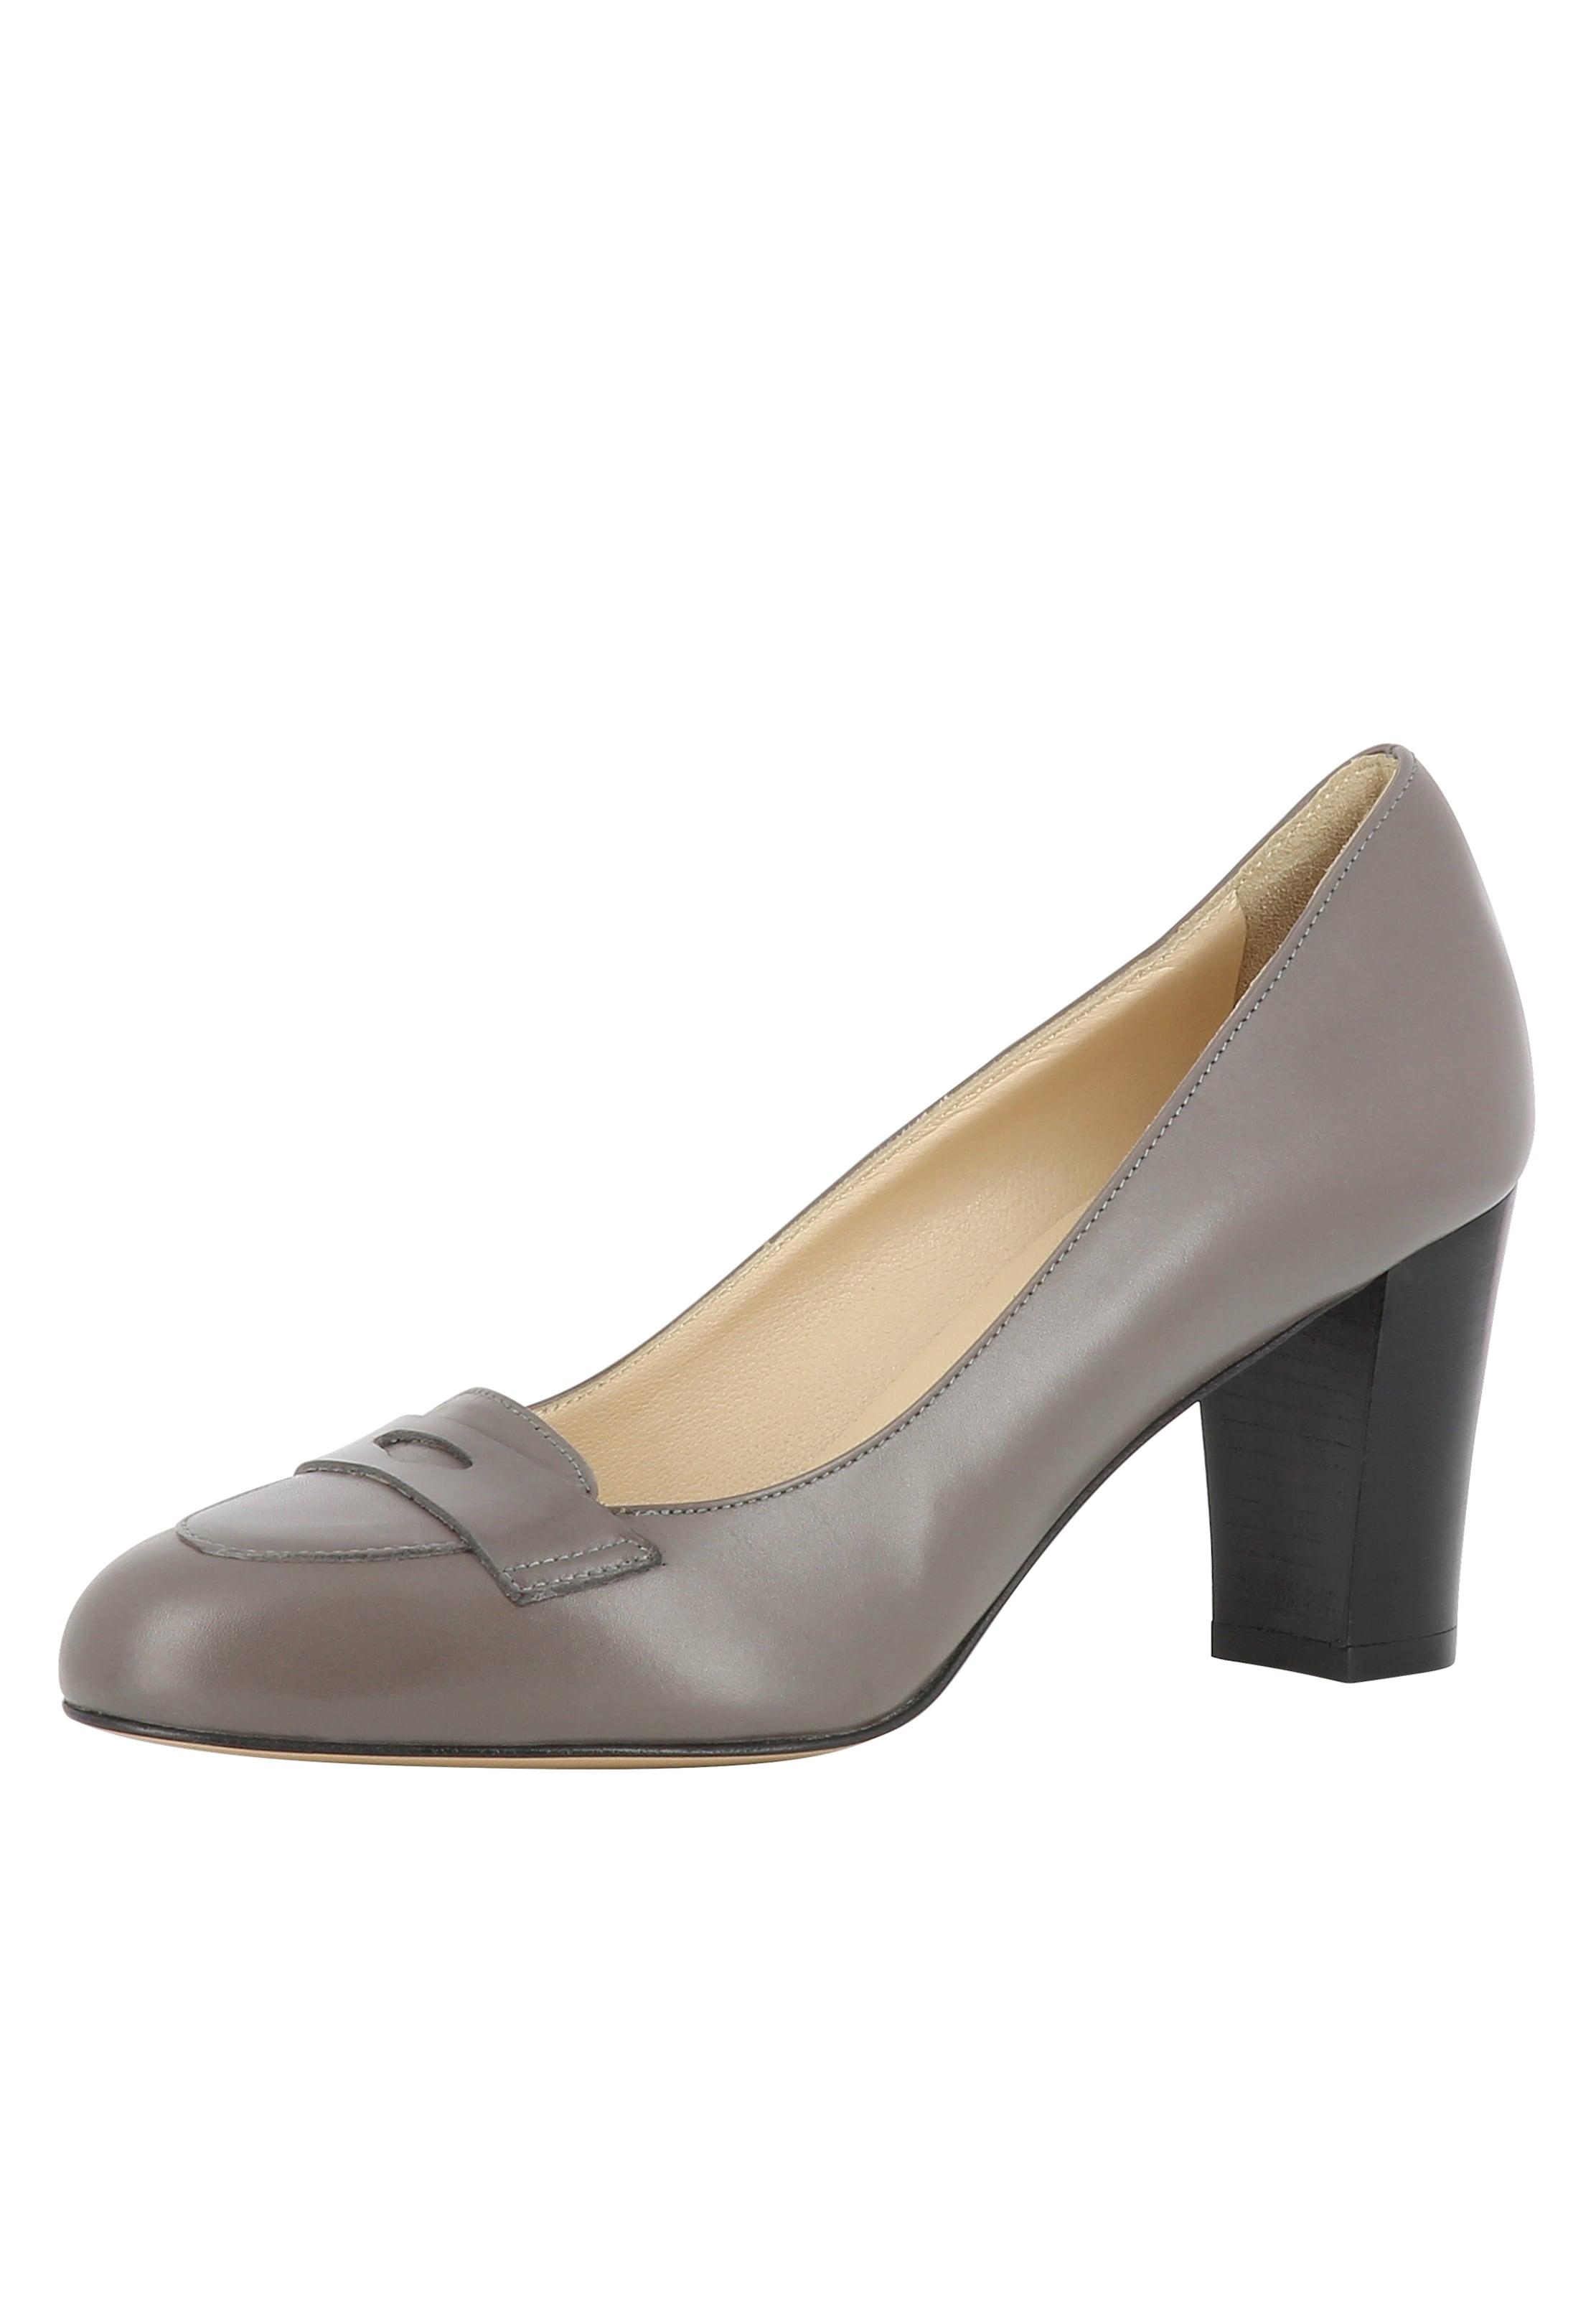 EVITA Pumps Damen Pumps EVITA BIANCA Verschleißfeste billige Schuhe 91916a